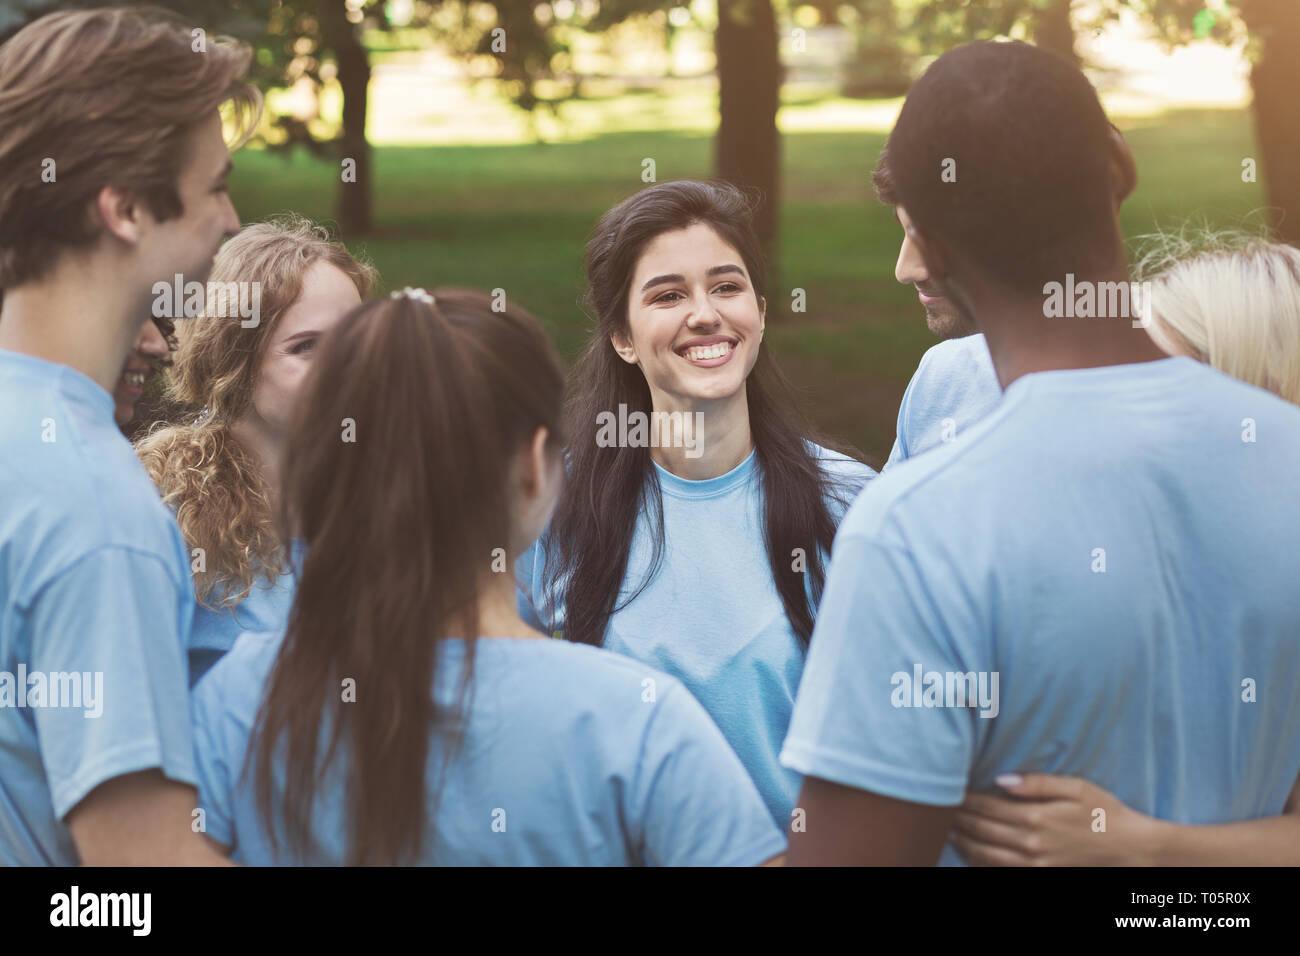 Meeting of young volunteers team in park - Stock Image